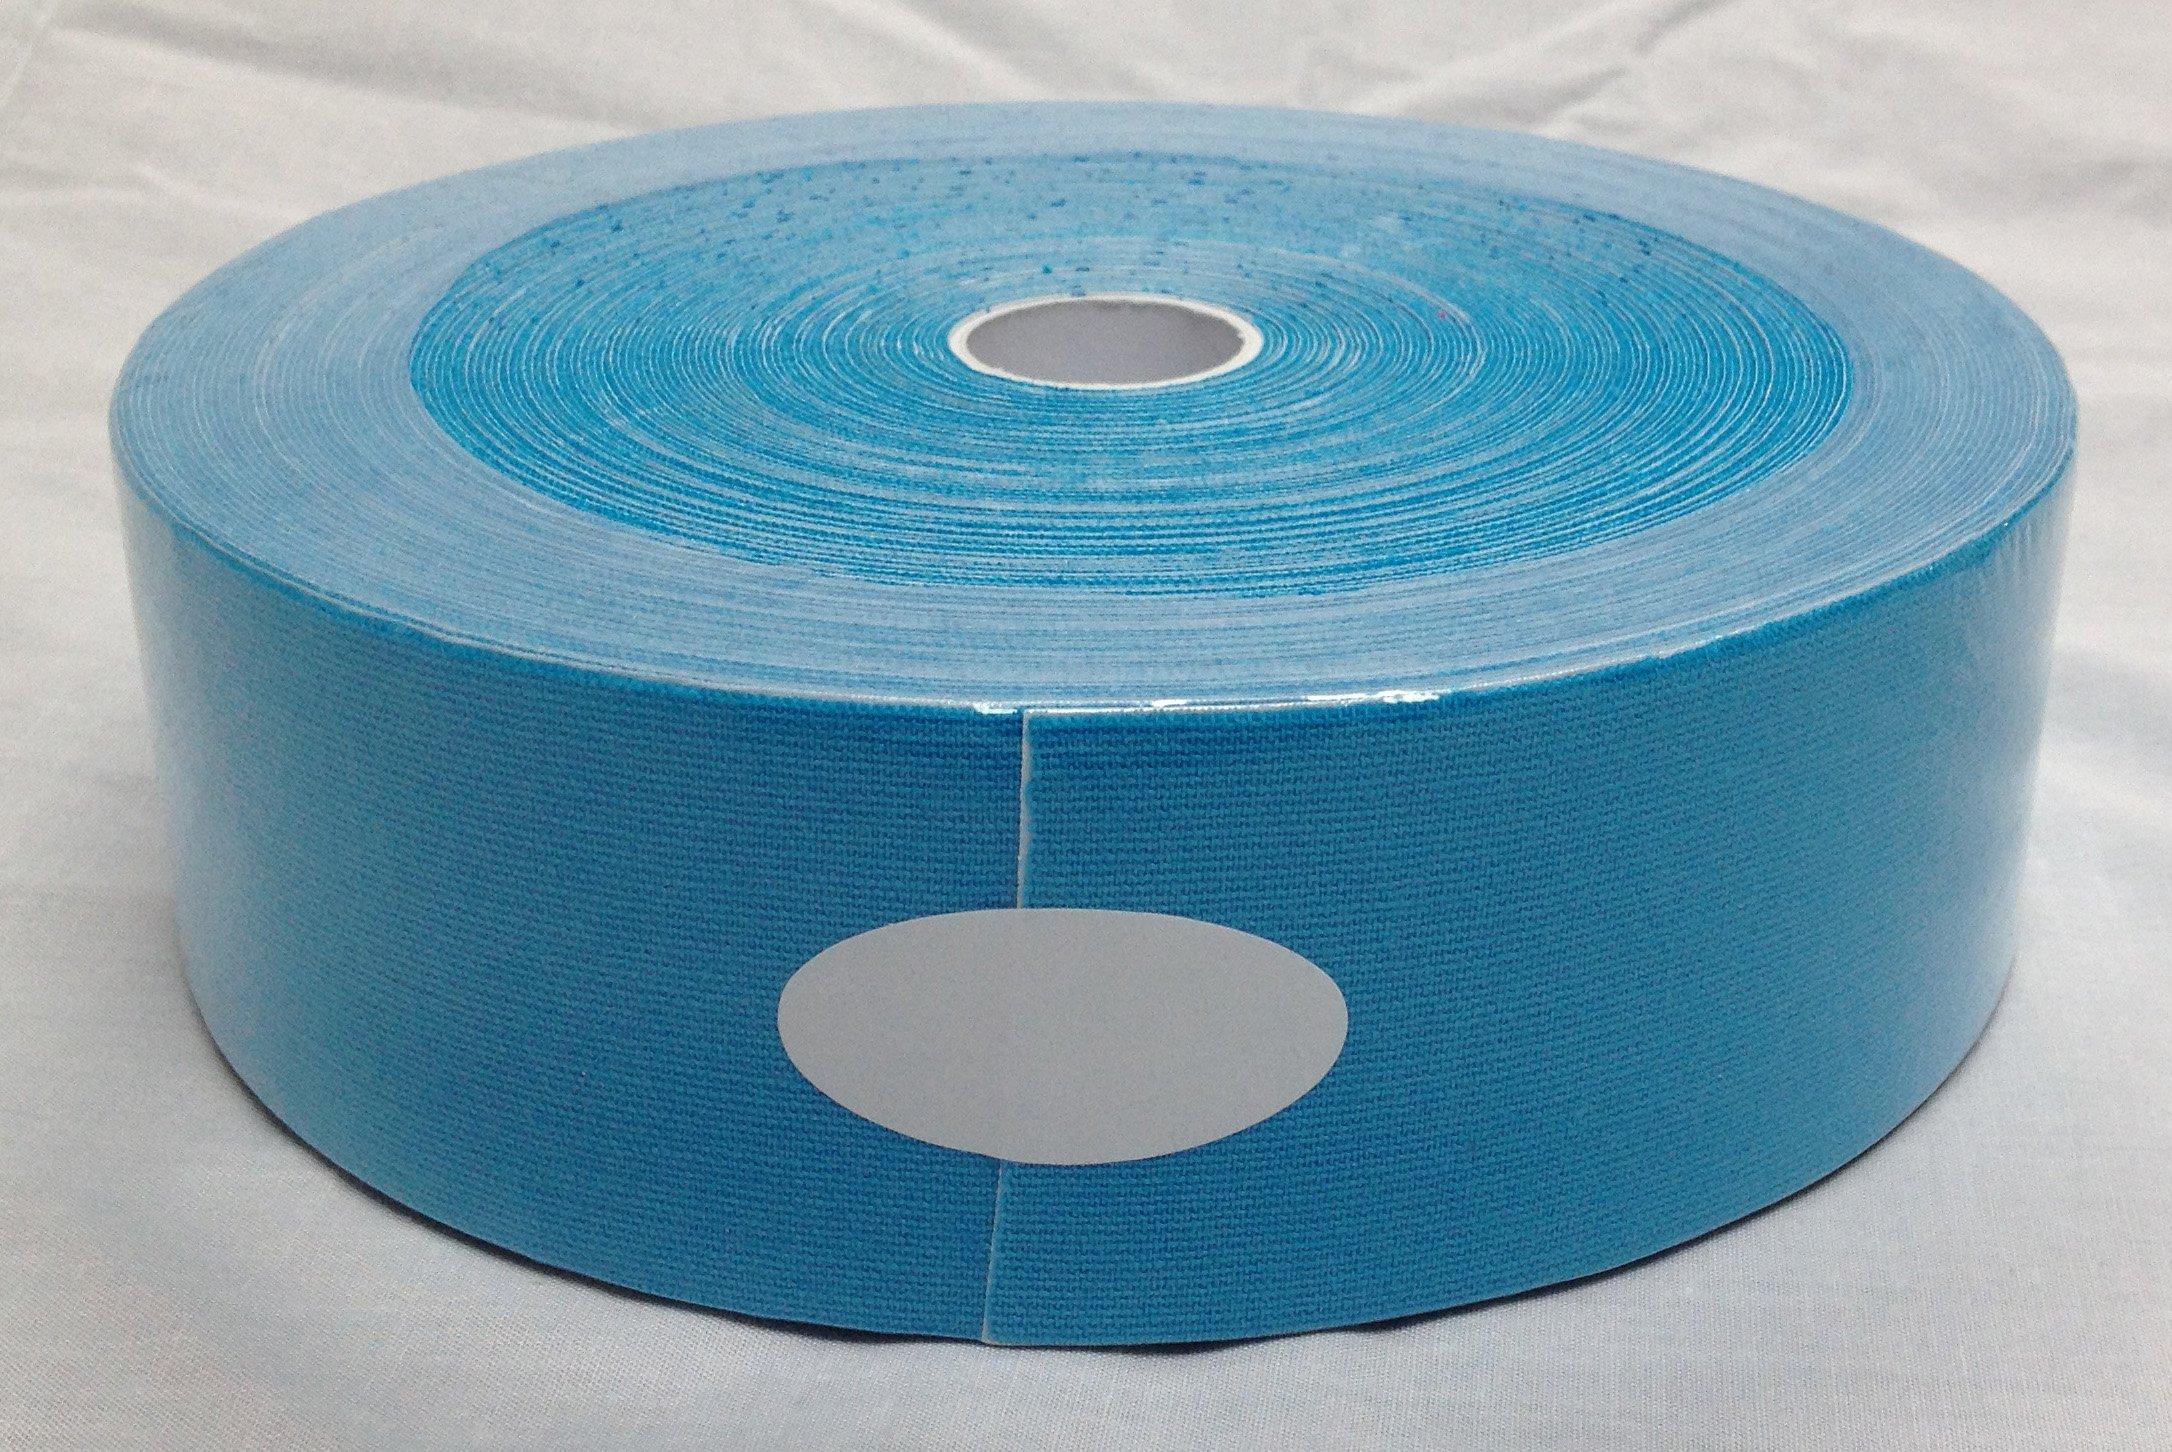 Therapist's Choice® Kinesiology Tape Bulk Roll (2-Inch x 105-Feet) (Blue)